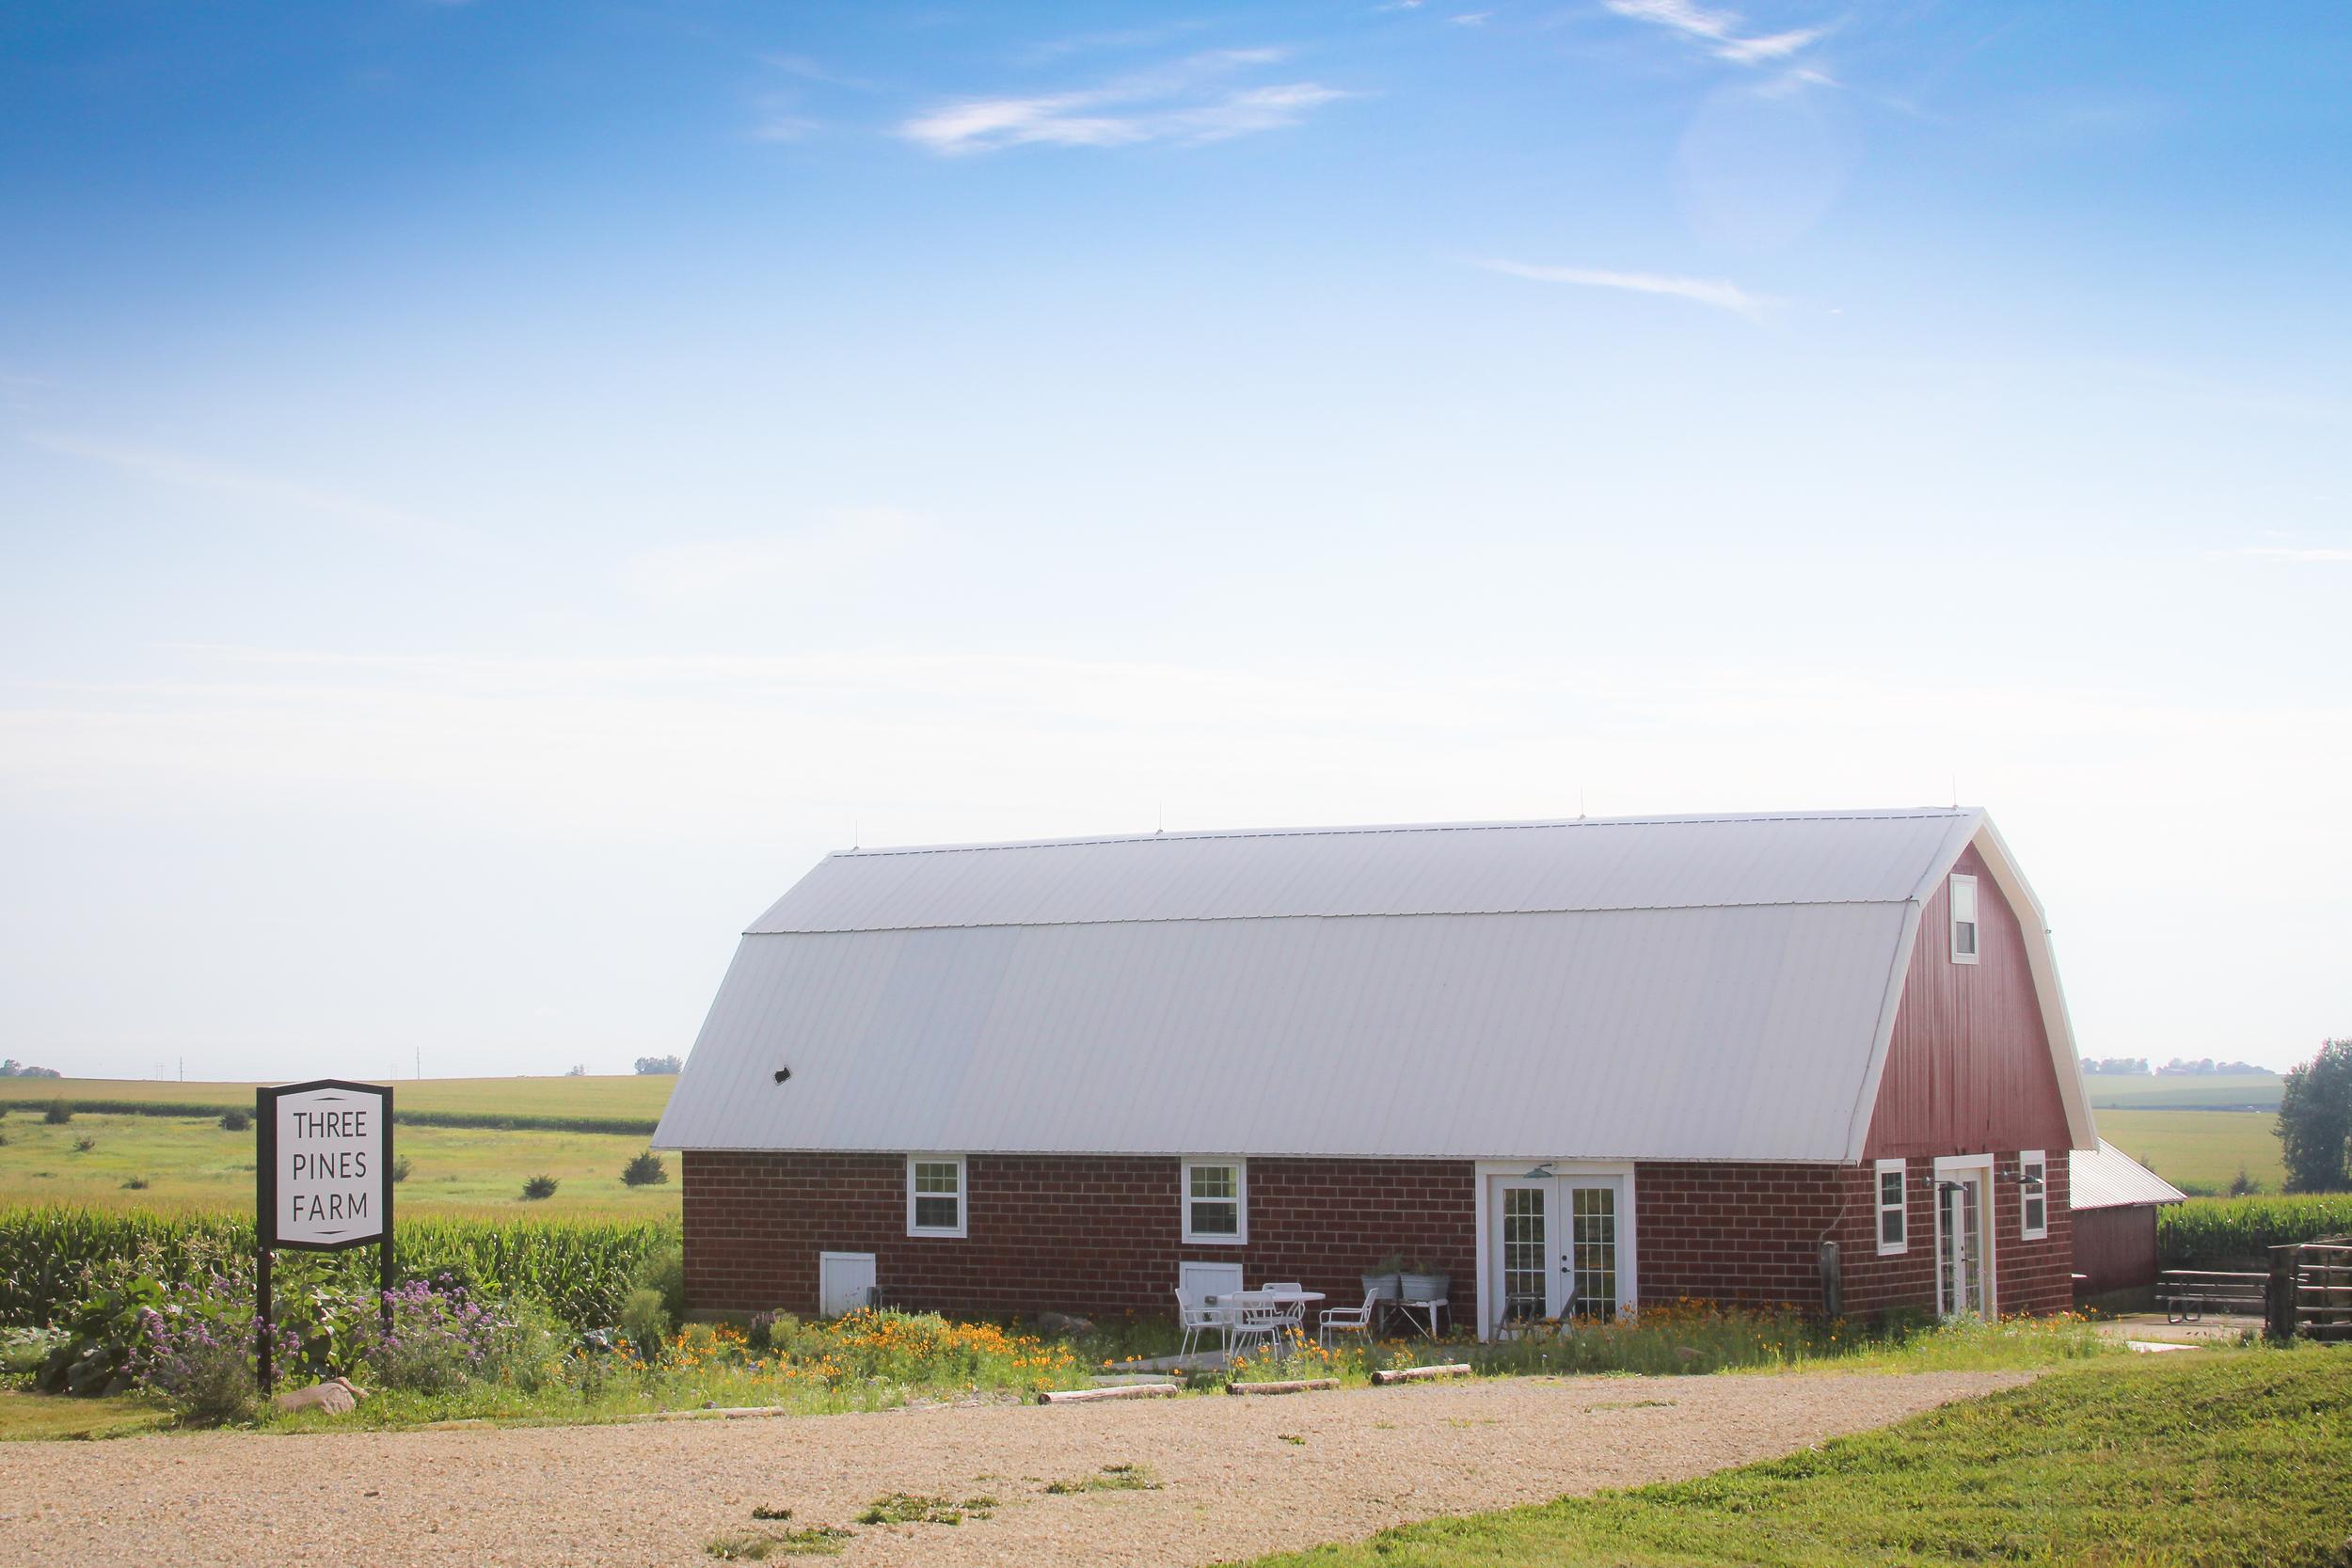 The studio at Three Pines Farm, August 8, 2015.